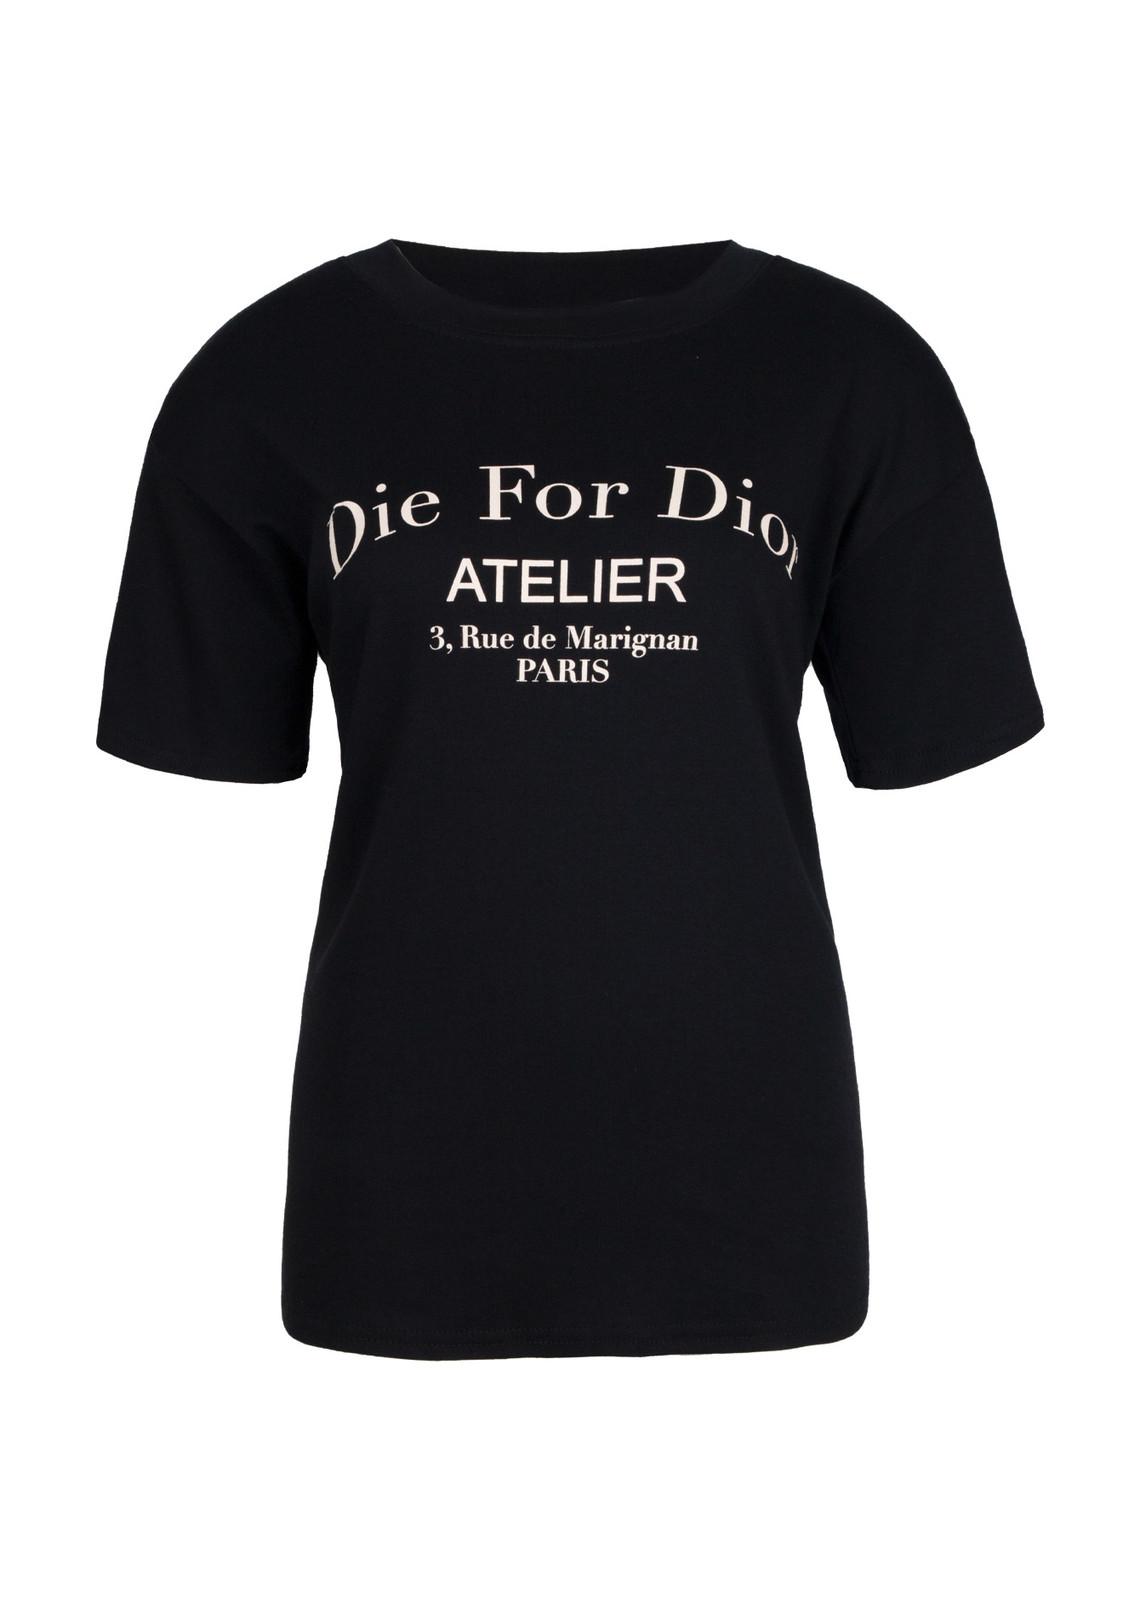 Die for shirt black